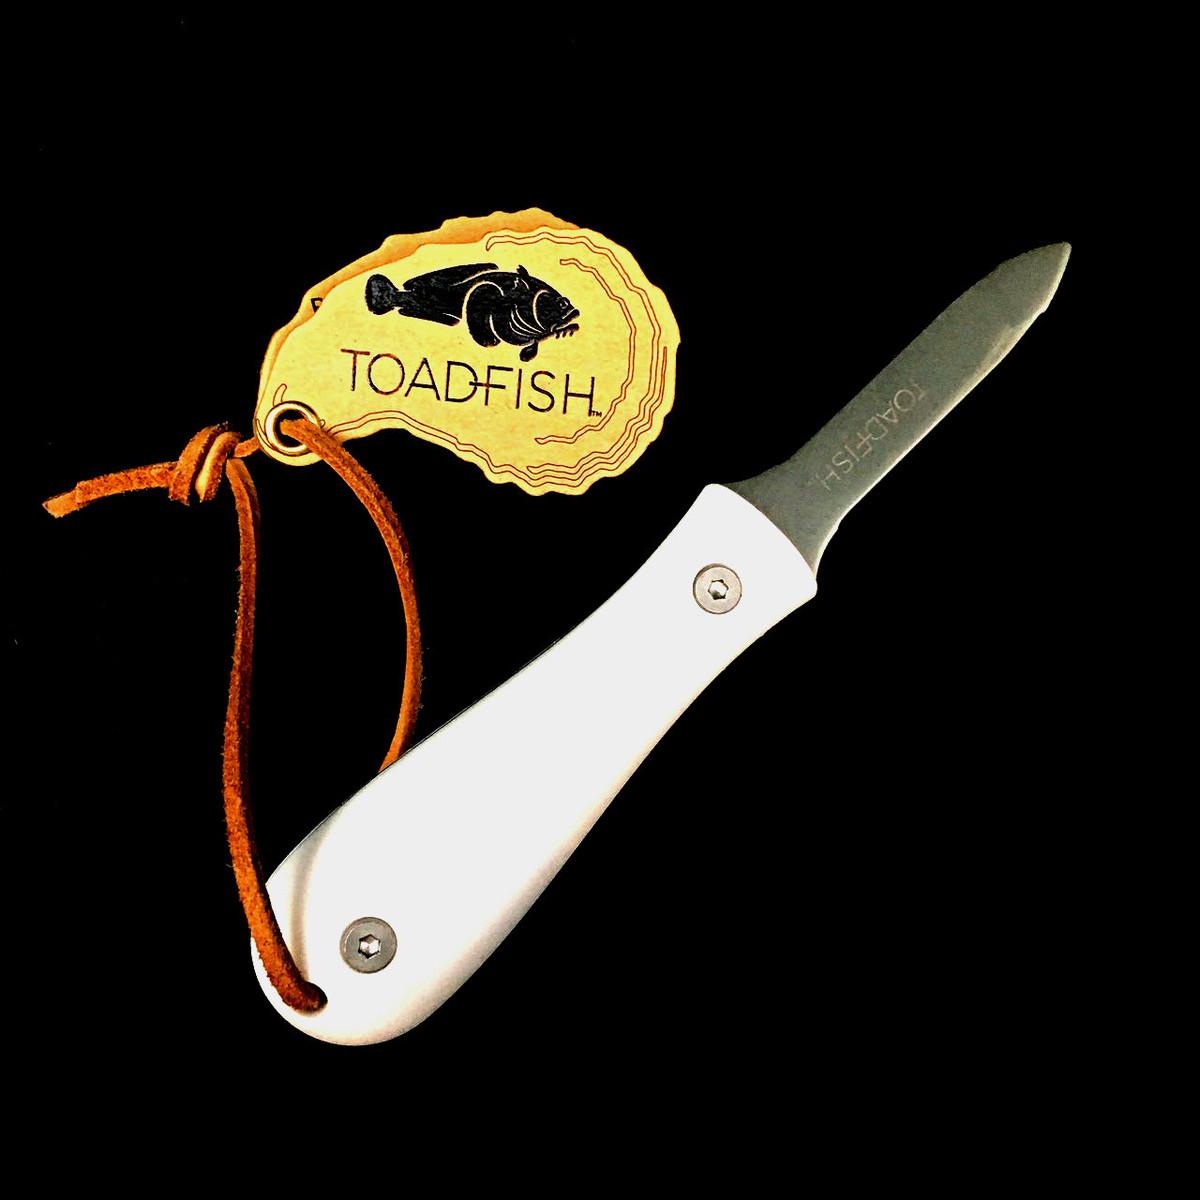 Toadfish - Shucker - White